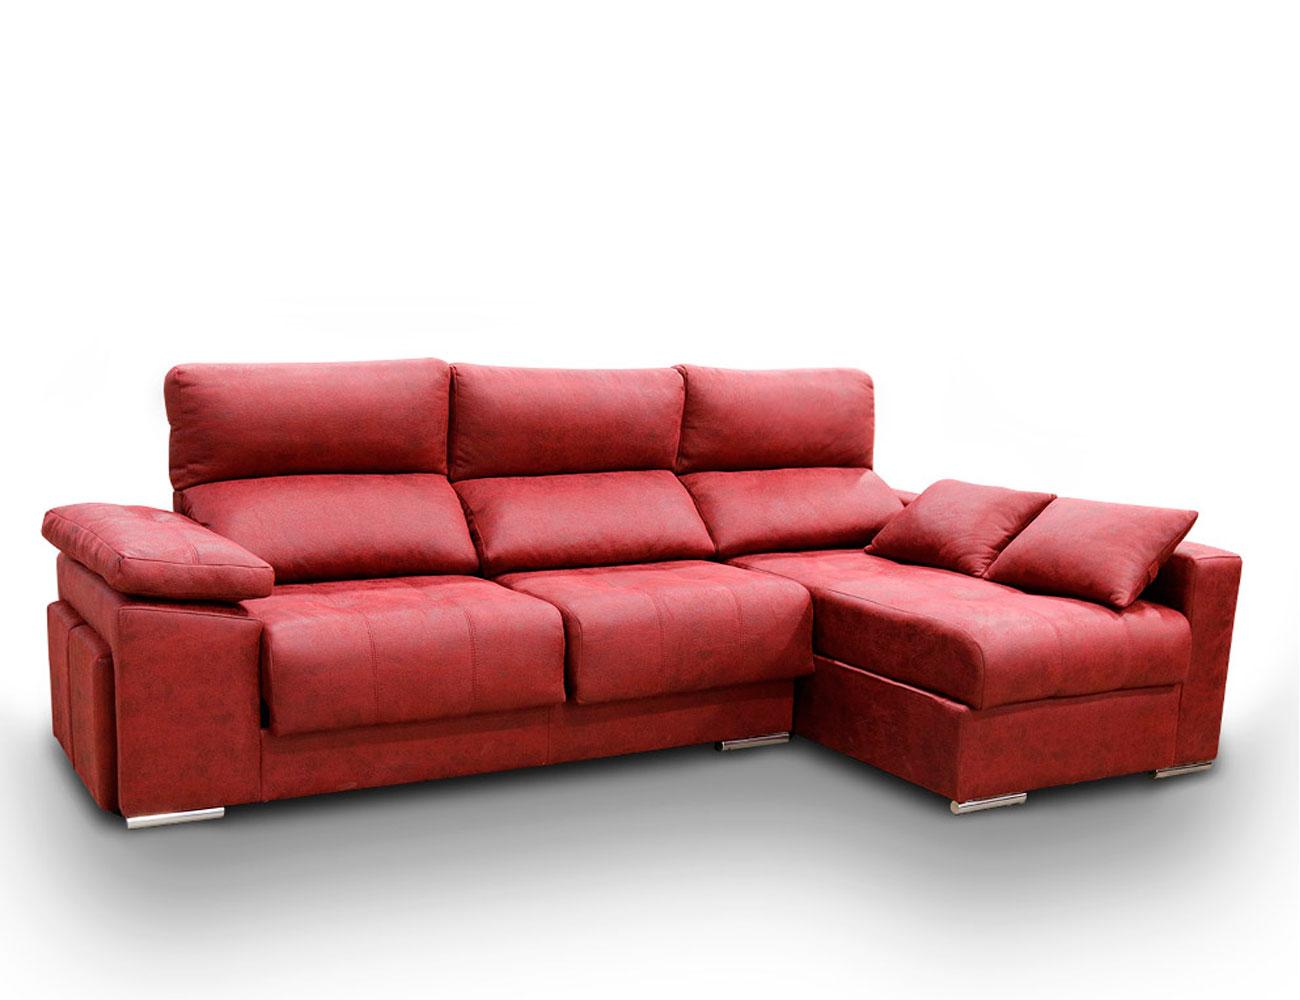 Sofa chaiselongue anti manchas rojo granate16